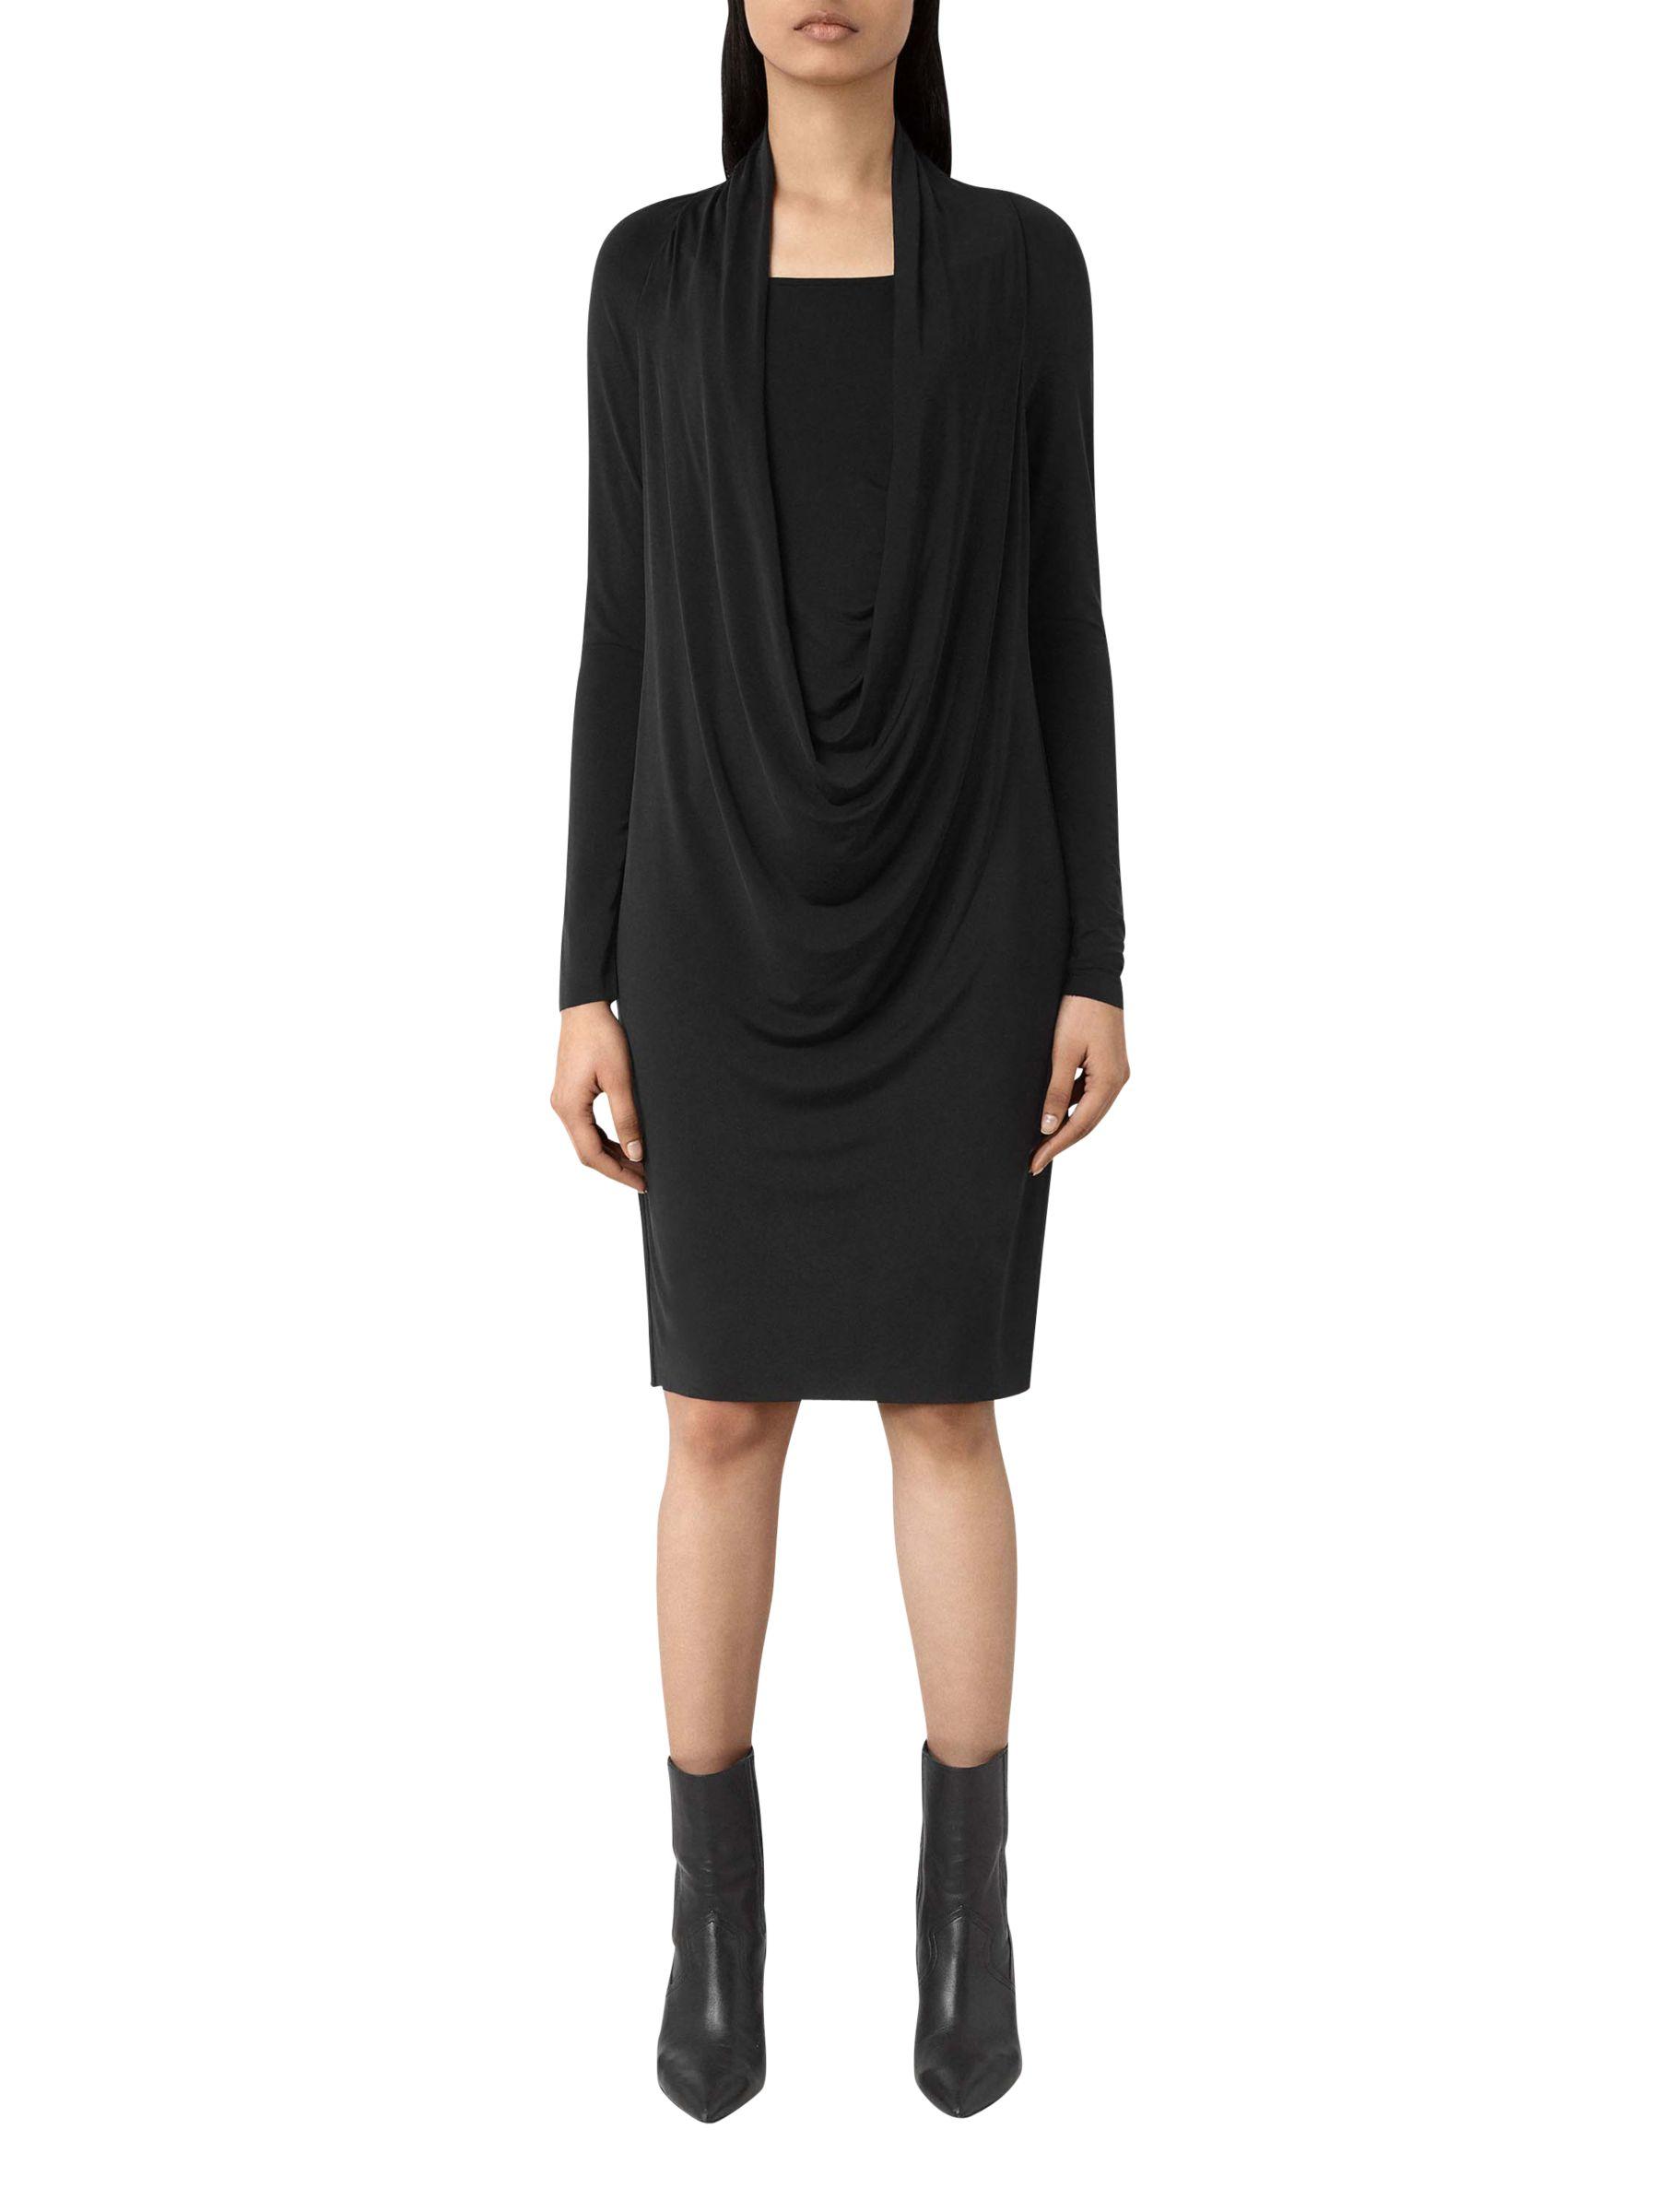 AllSaints AllSaints Invi Dress, Black